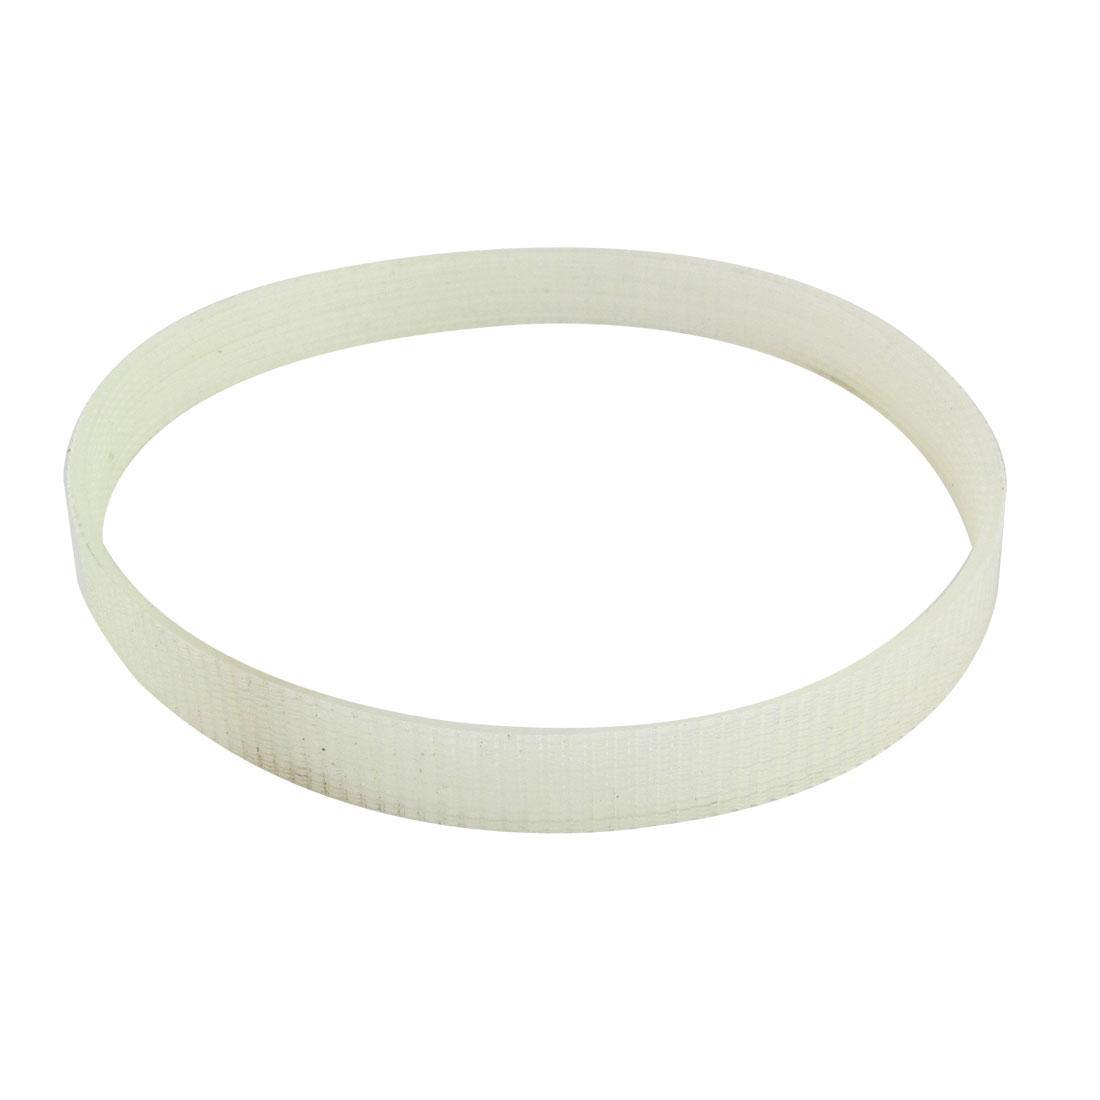 65cm Girth Nylon Repairing Component Digimate 355 Cutting Machine Drive Belt